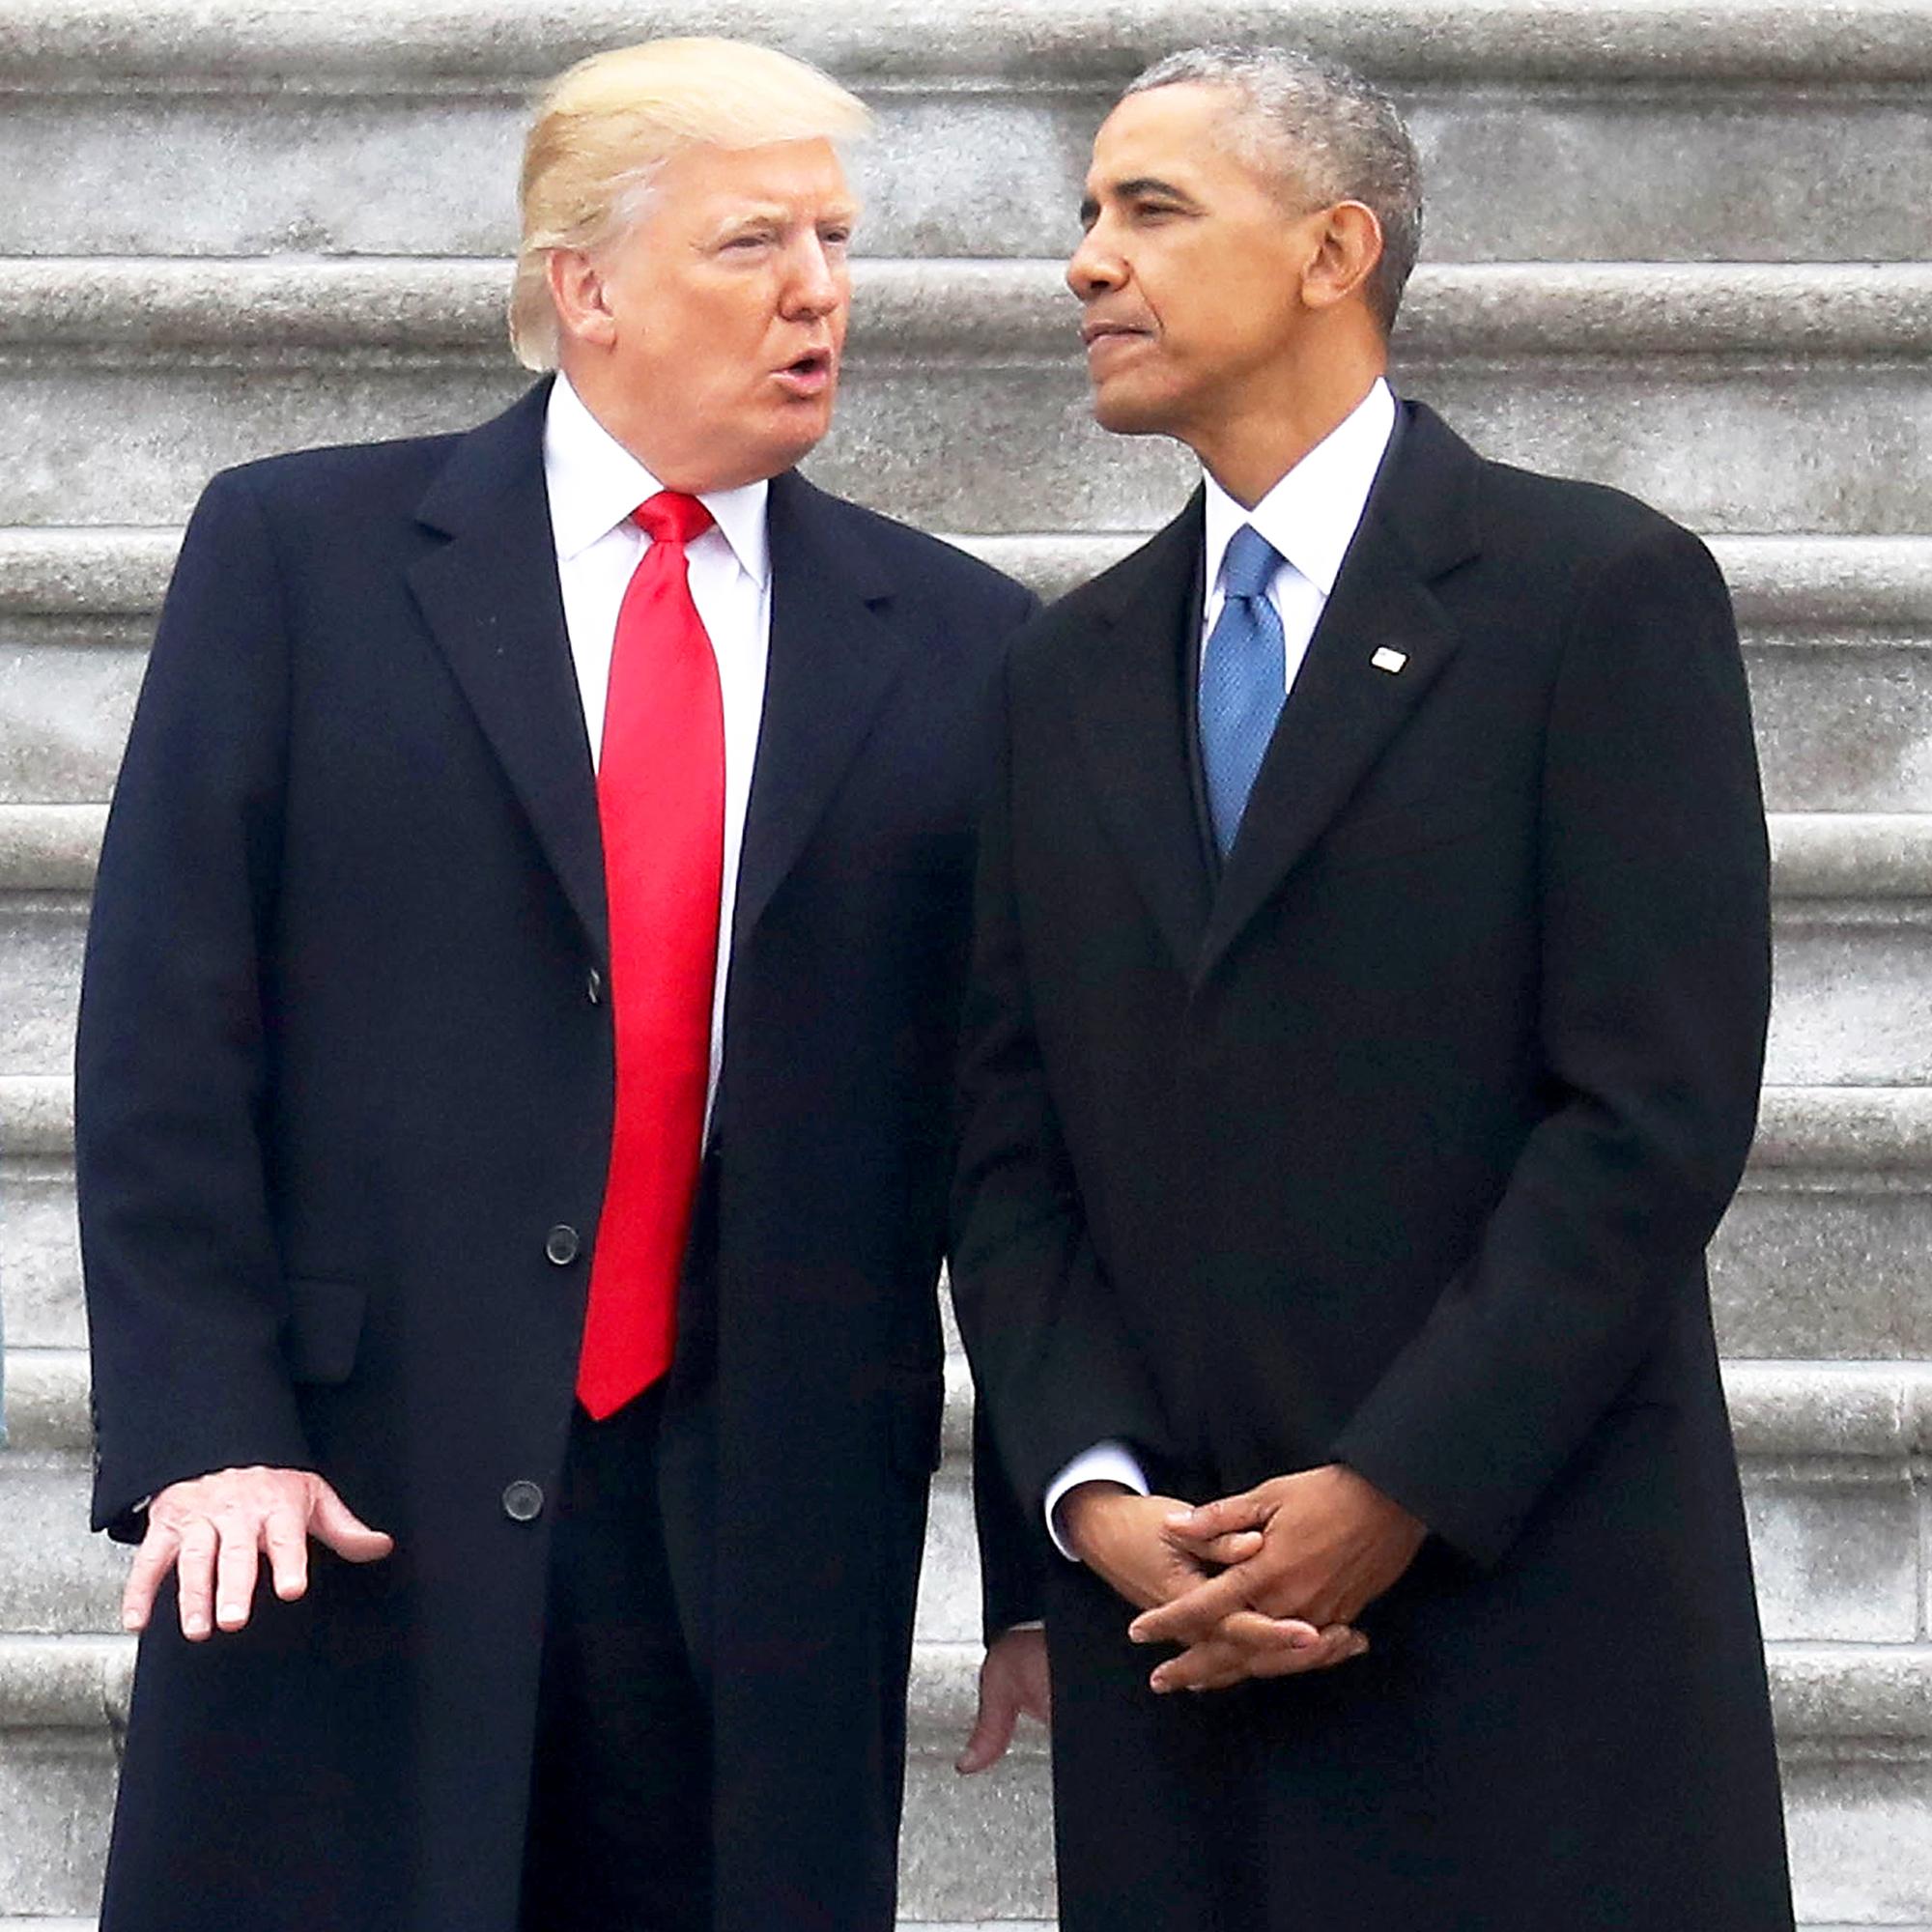 barack obama criticizes trump s travel ban